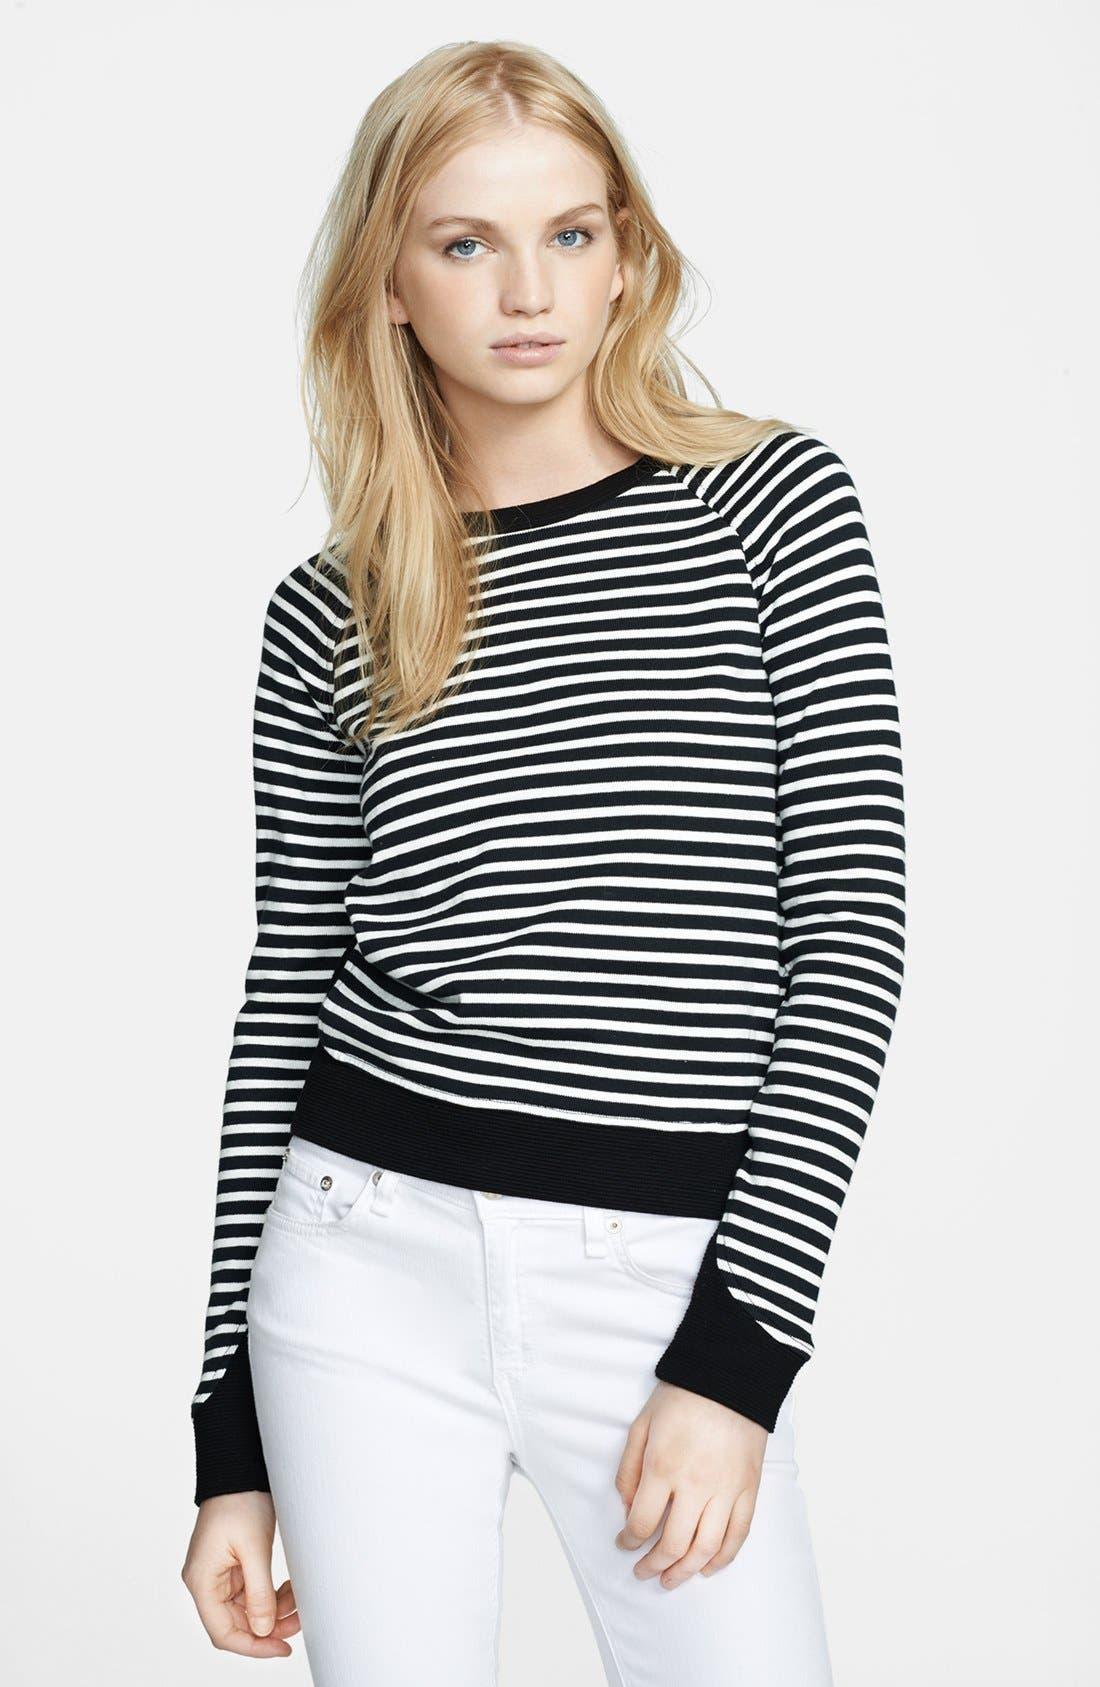 Main Image - Whetherly 'Liam' Stripe Knit Sweater